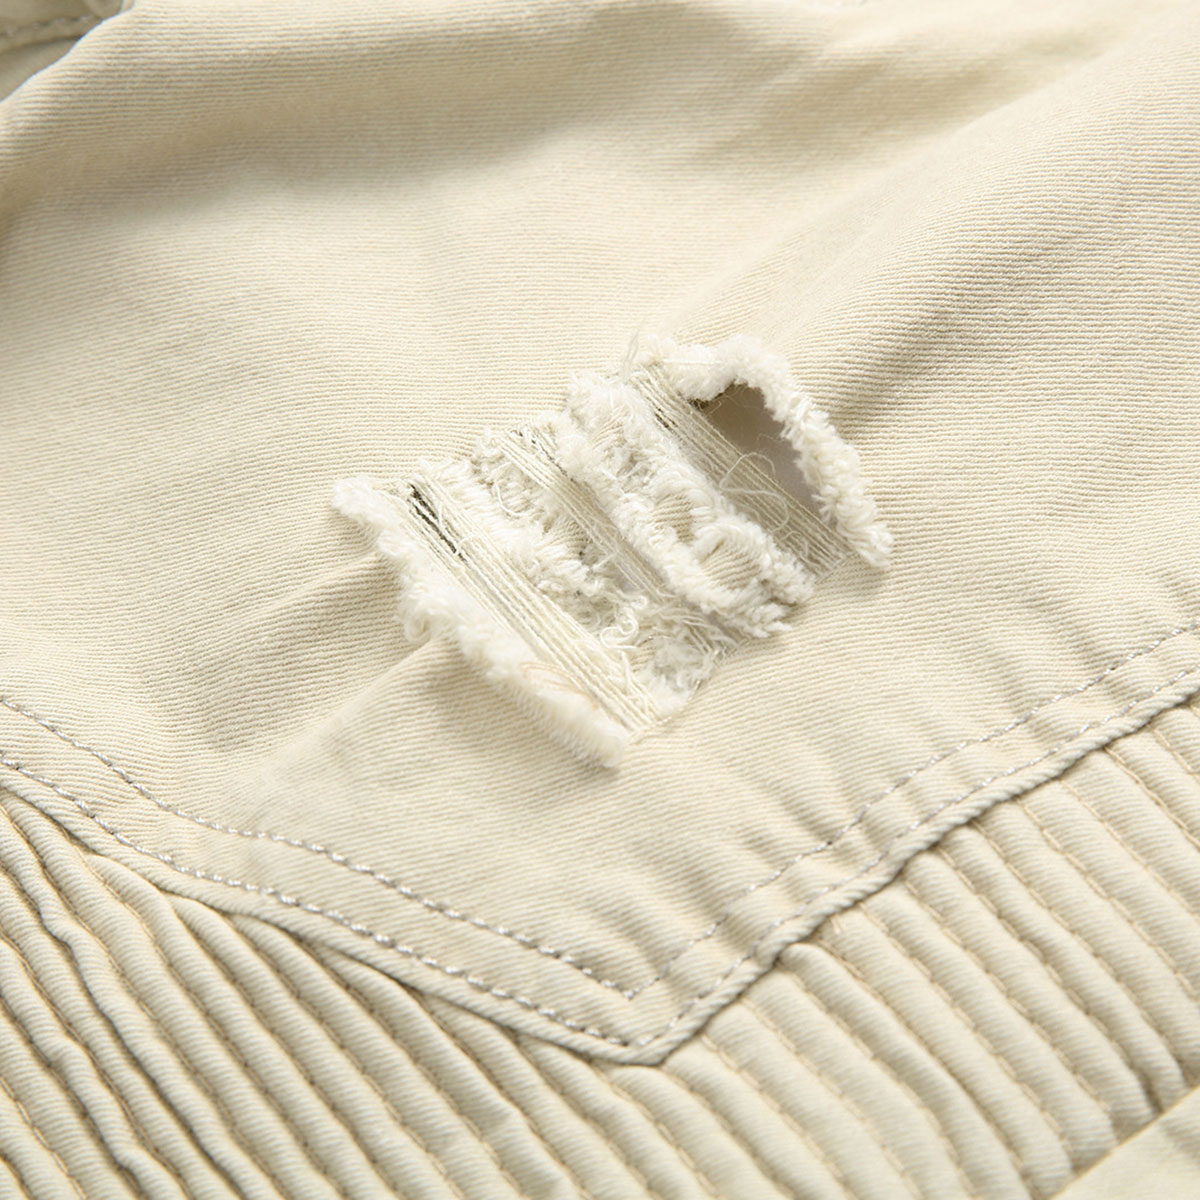 Men-039-s-Skinny-Biker-Jeans-Destroyed-Slim-Fit-Denim-Ripped-Pencil-Pants-Trousers thumbnail 36